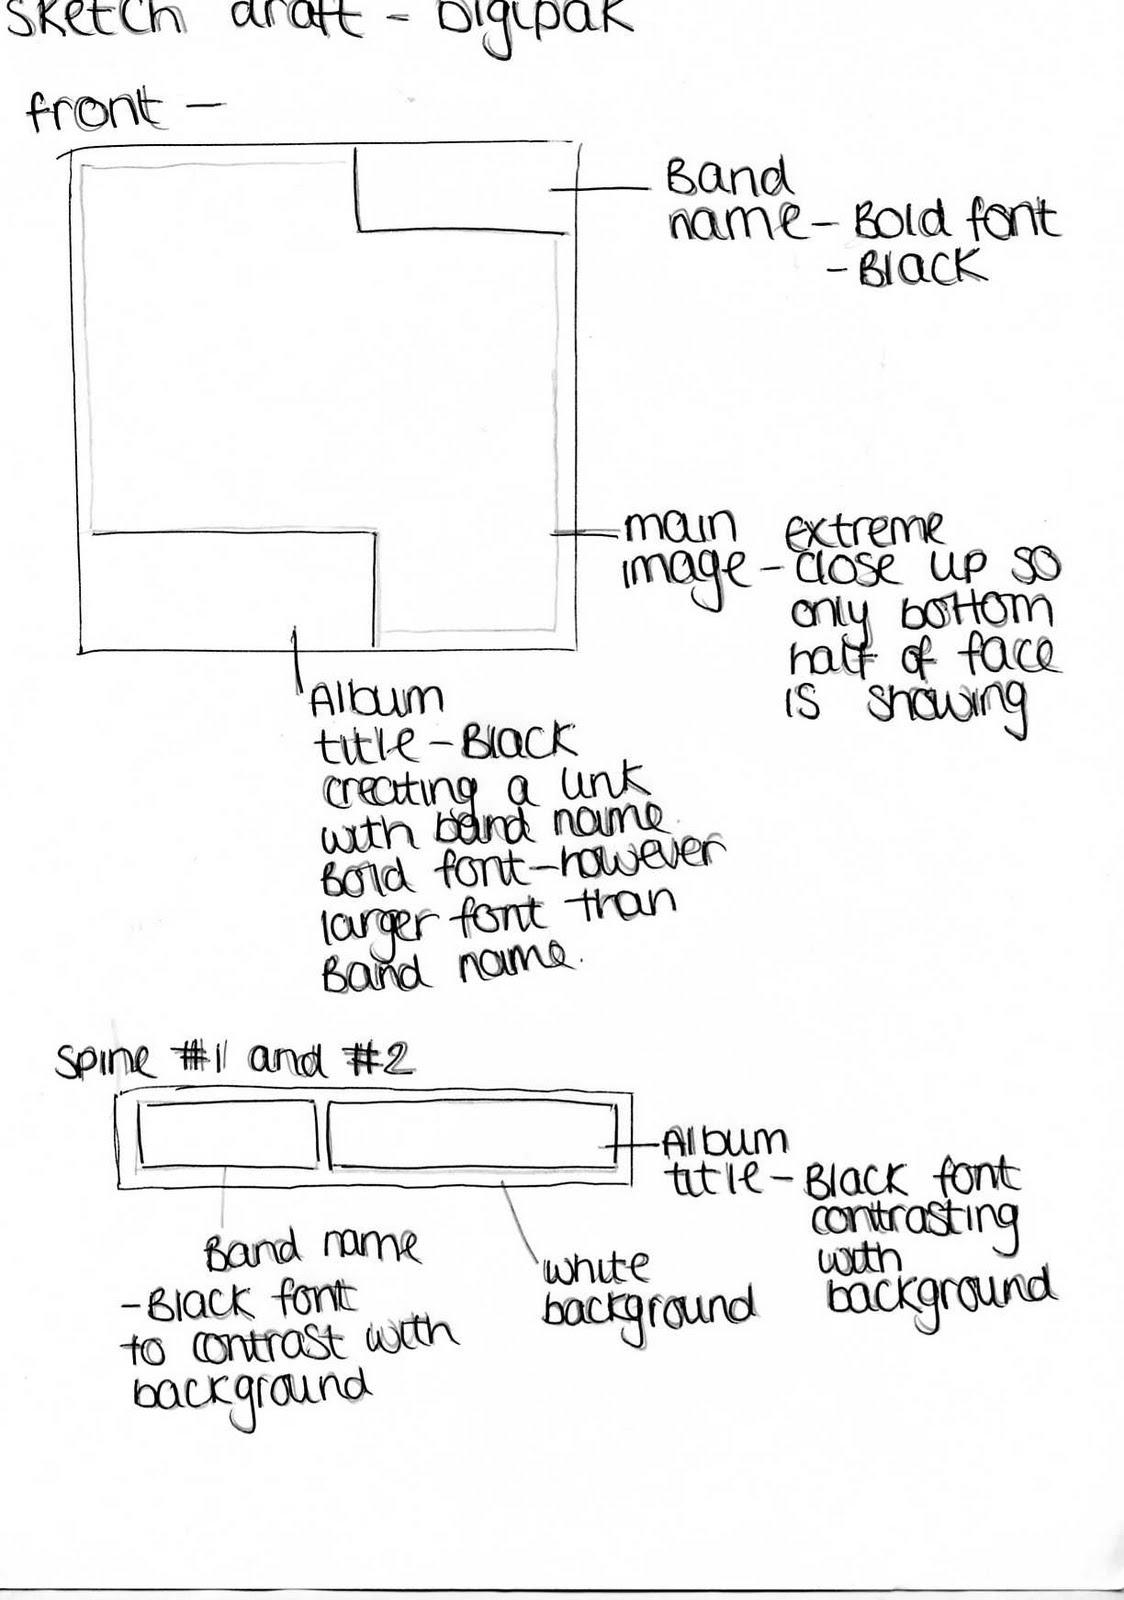 A2 Media Studies Advanced Portfolio: Digipak Design Sketch Draft